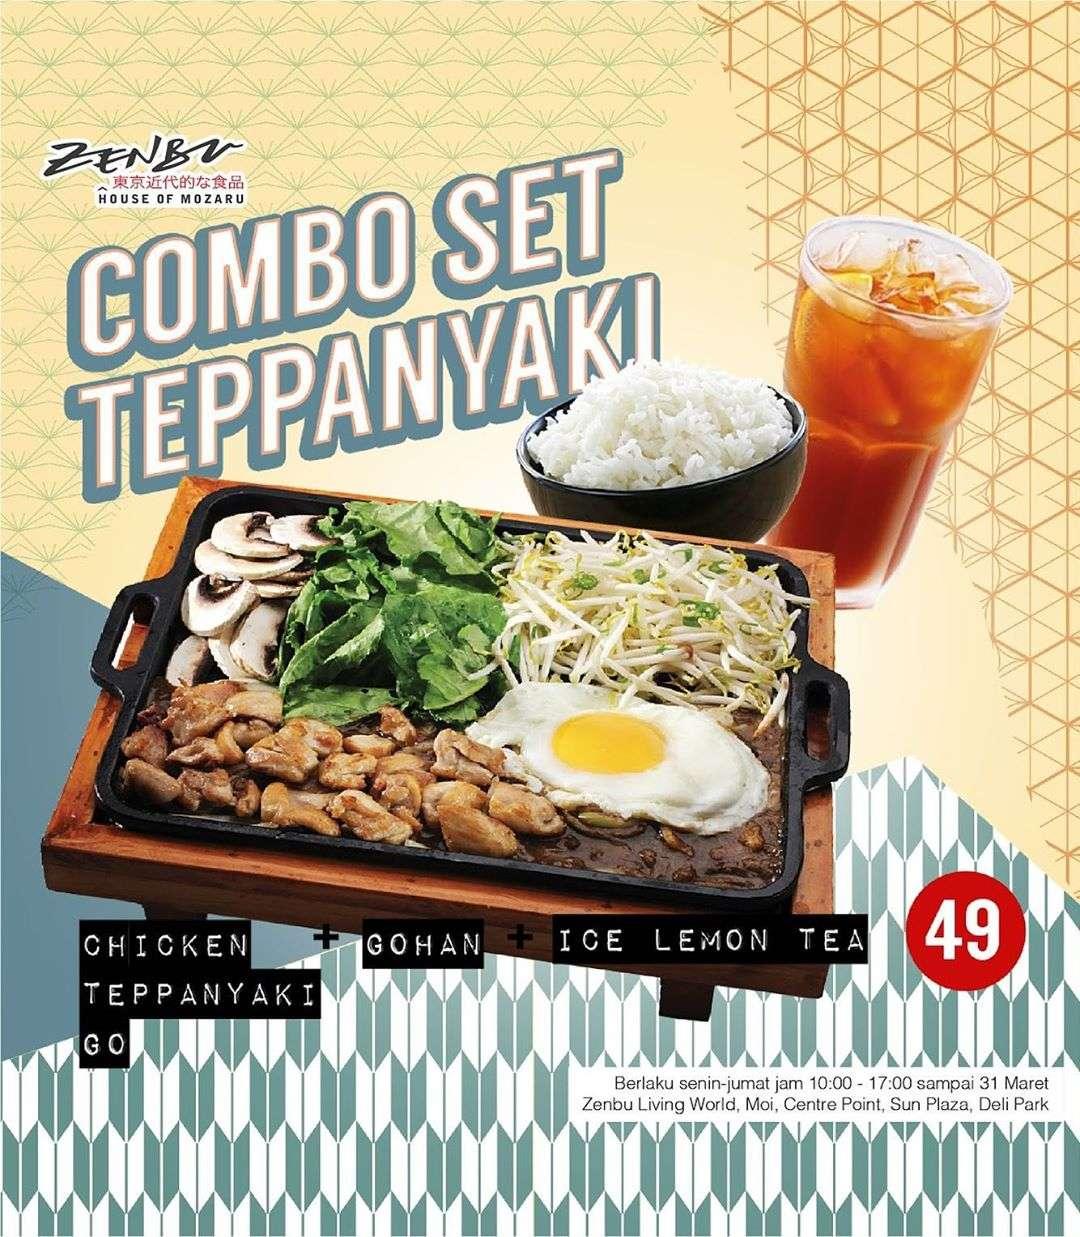 Zenbu Promo Combo Set Teppanyaki For Only IDR 49.000